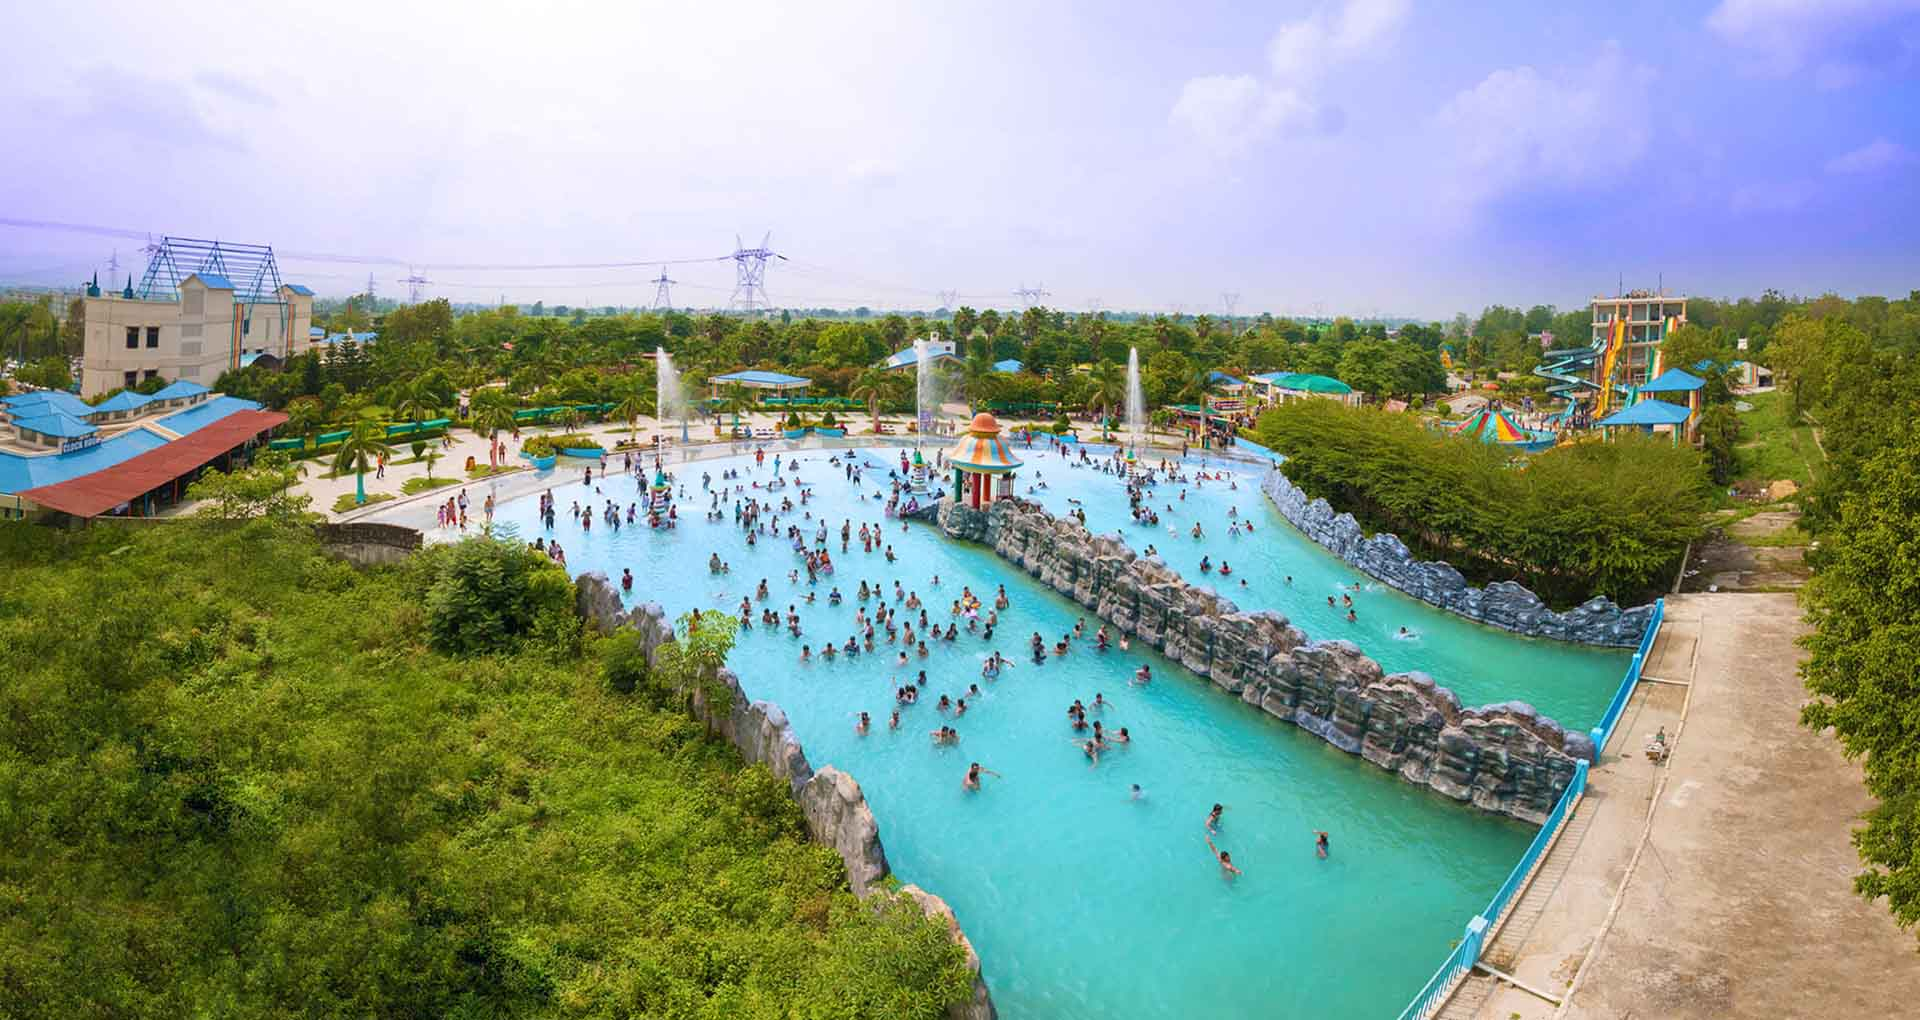 Fun Valley Water and Amusement Park in Dehradun